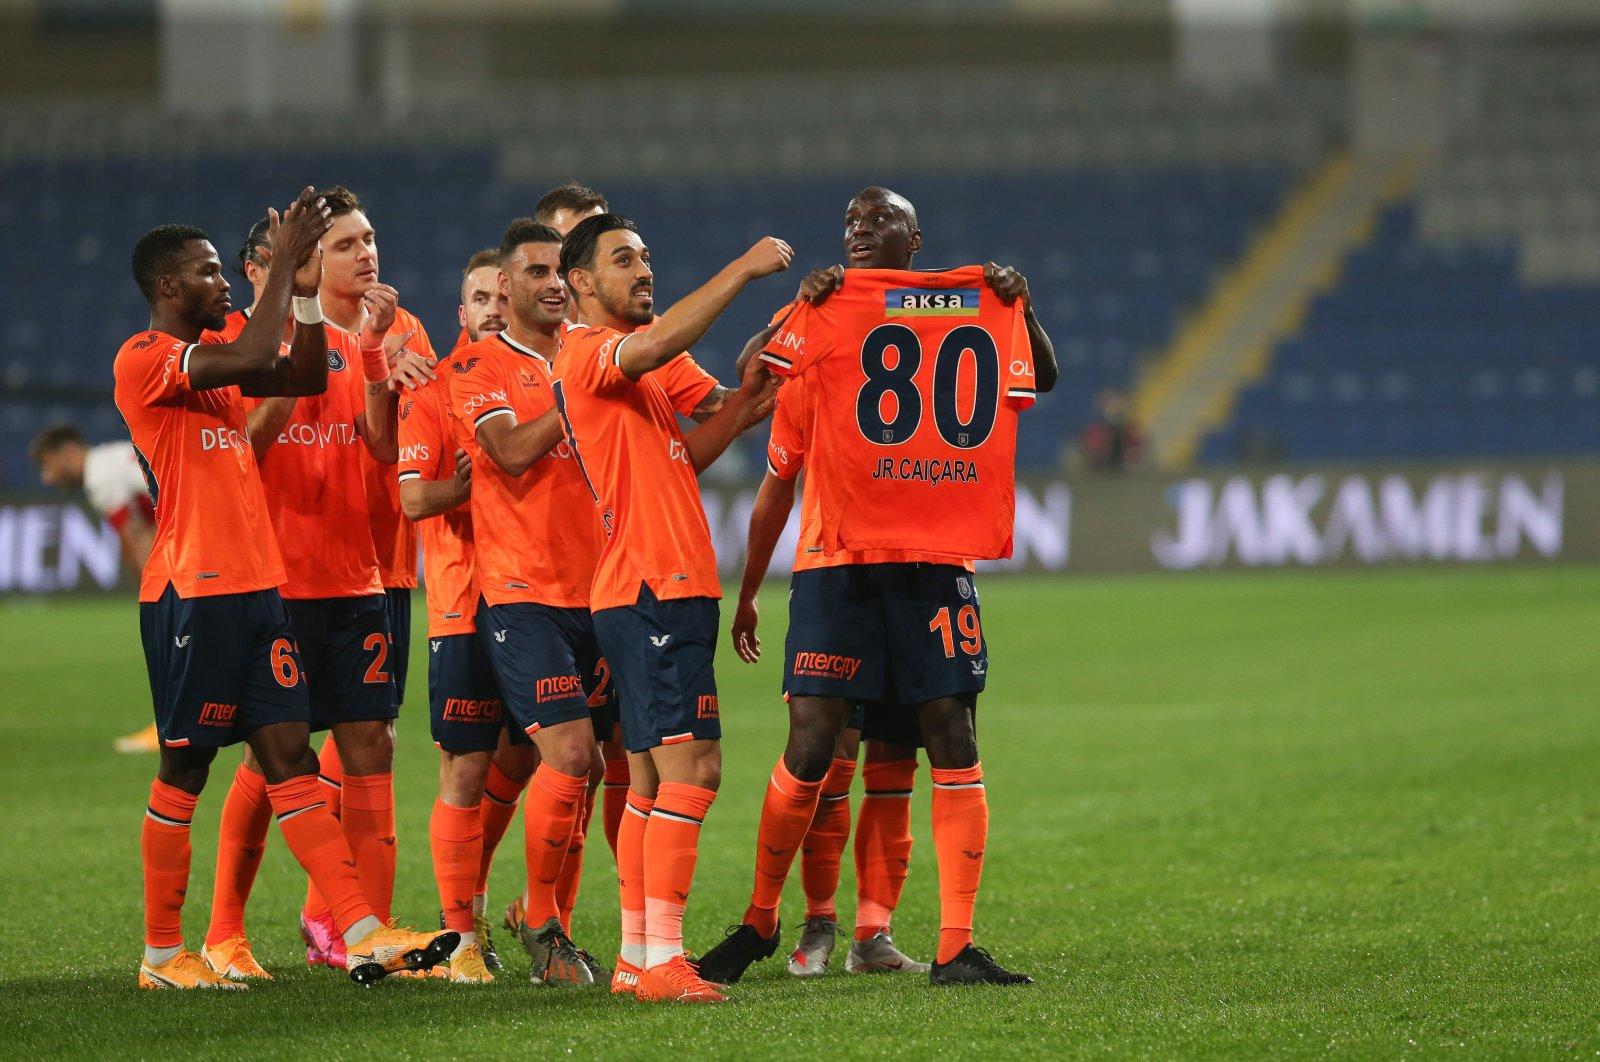 Medipol Başakşehir players dedicate their first goal to their injured teammate Junior Caiçara during the Turkish Süper Lig Week six match against Antalyaspor, at Başakşehir Fatih Terim Stadium in Istanbul, on Oct. 24, 2020. (AA Photo)